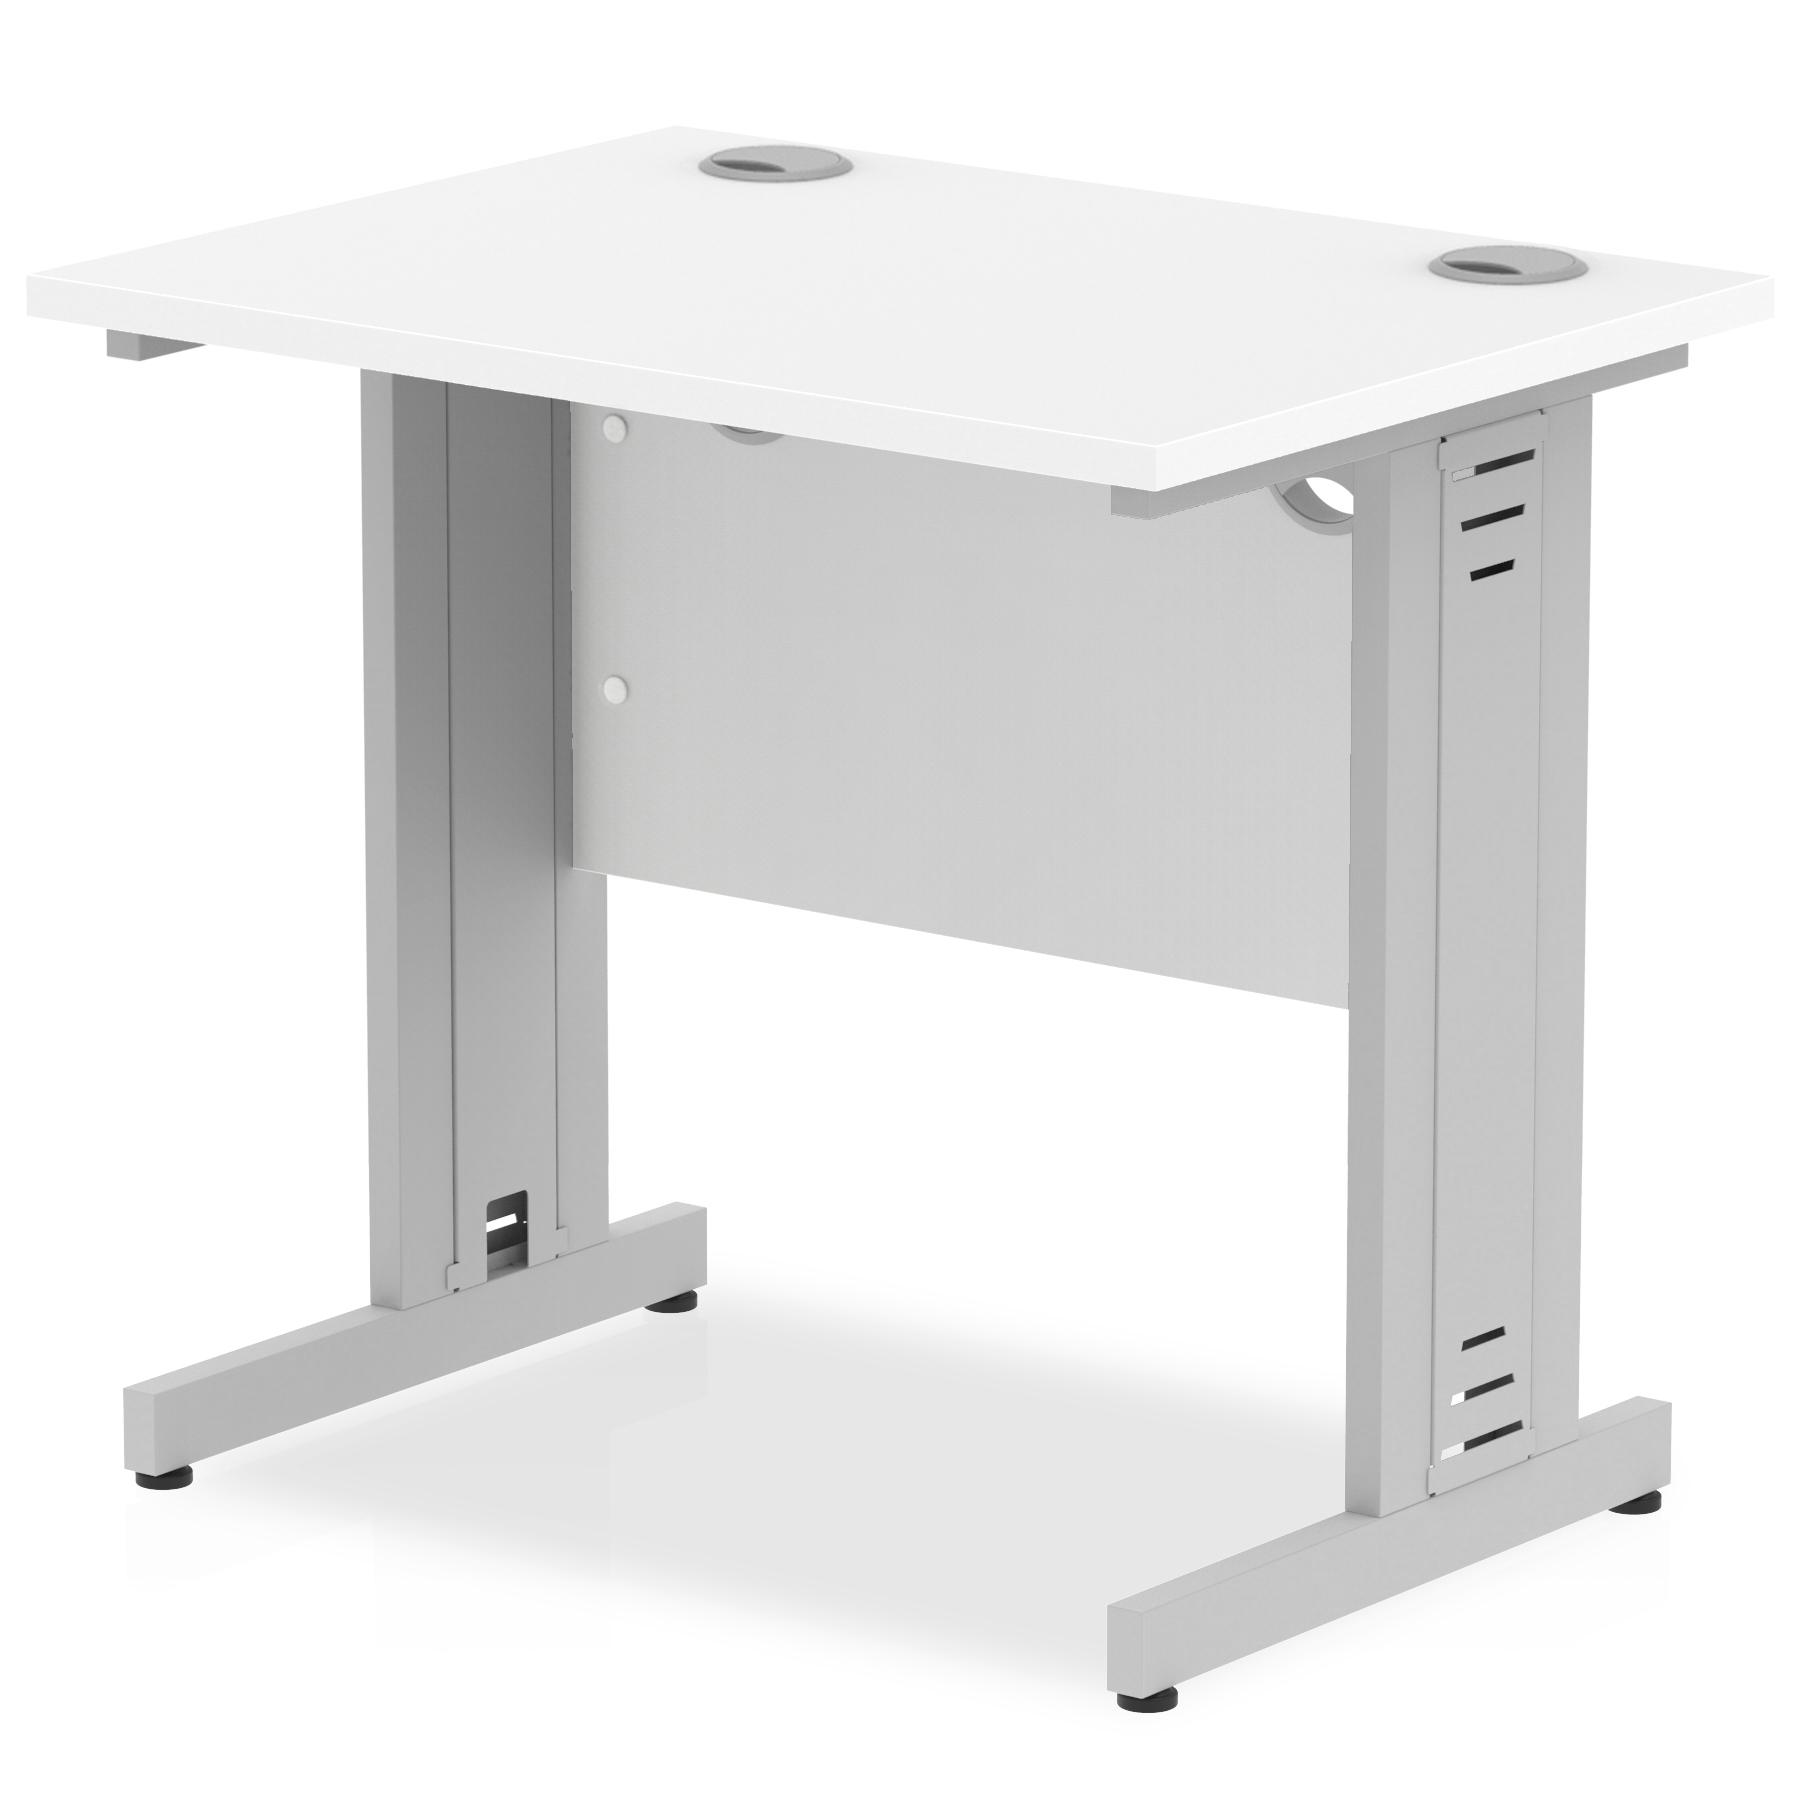 Trexus Desk Rectangle Cable Managed Silver Leg 800x600mm White Ref MI002897